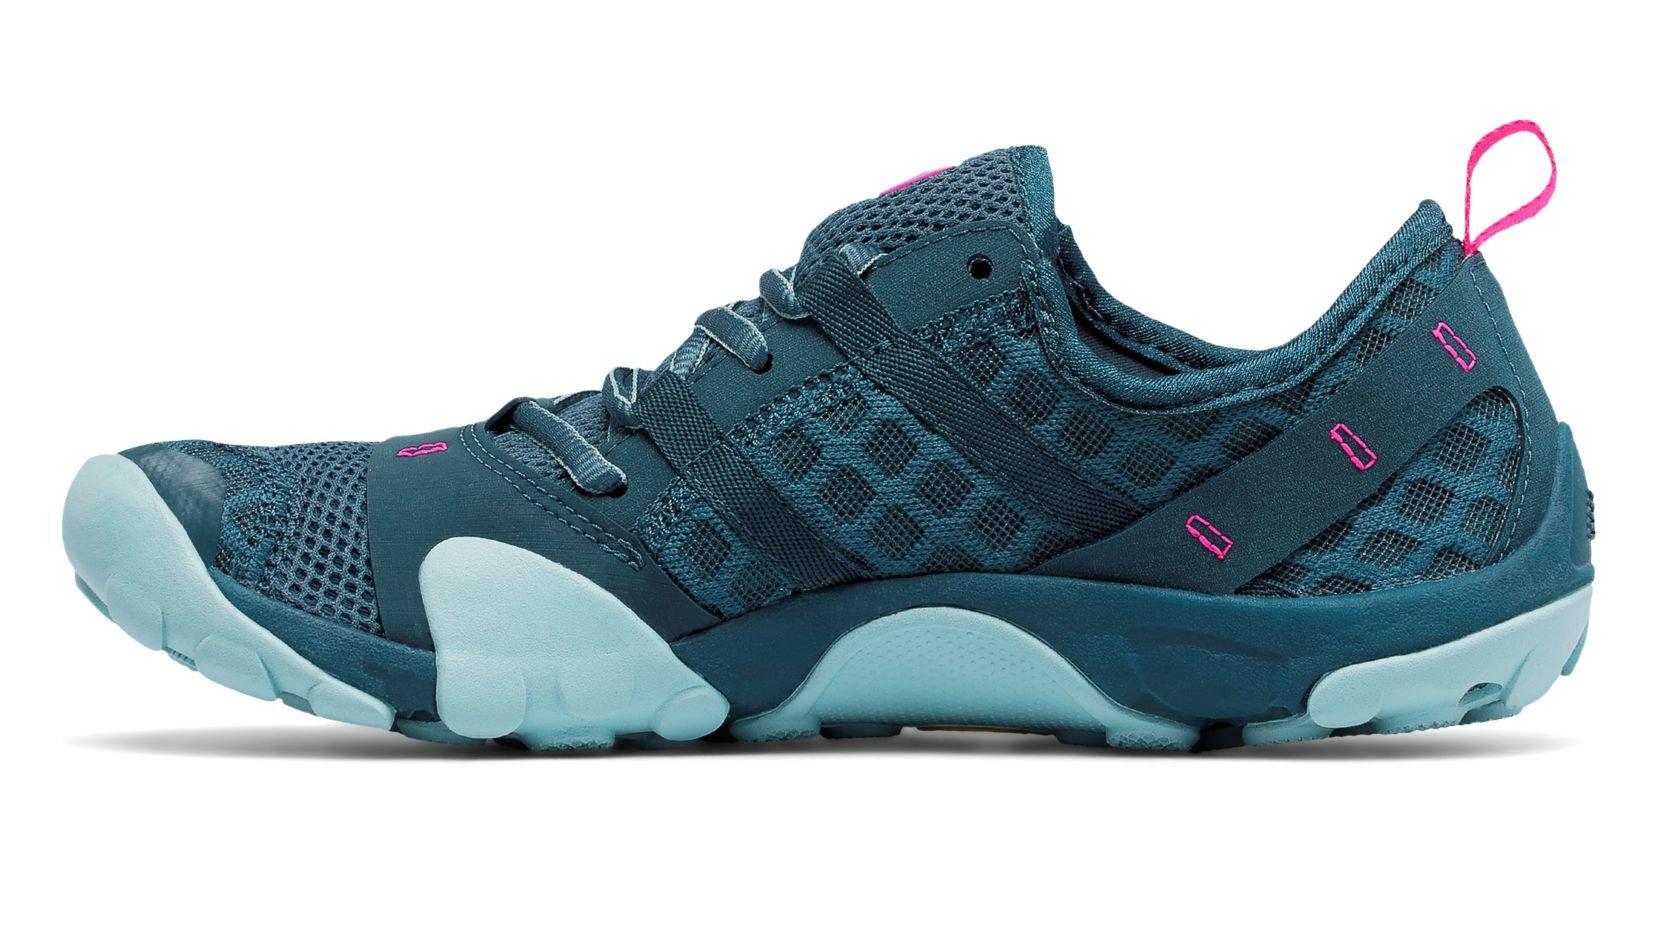 quality design 5427f 56c7b Women's - New Balance Minimus 10v1 Trail | Everyday Athlete